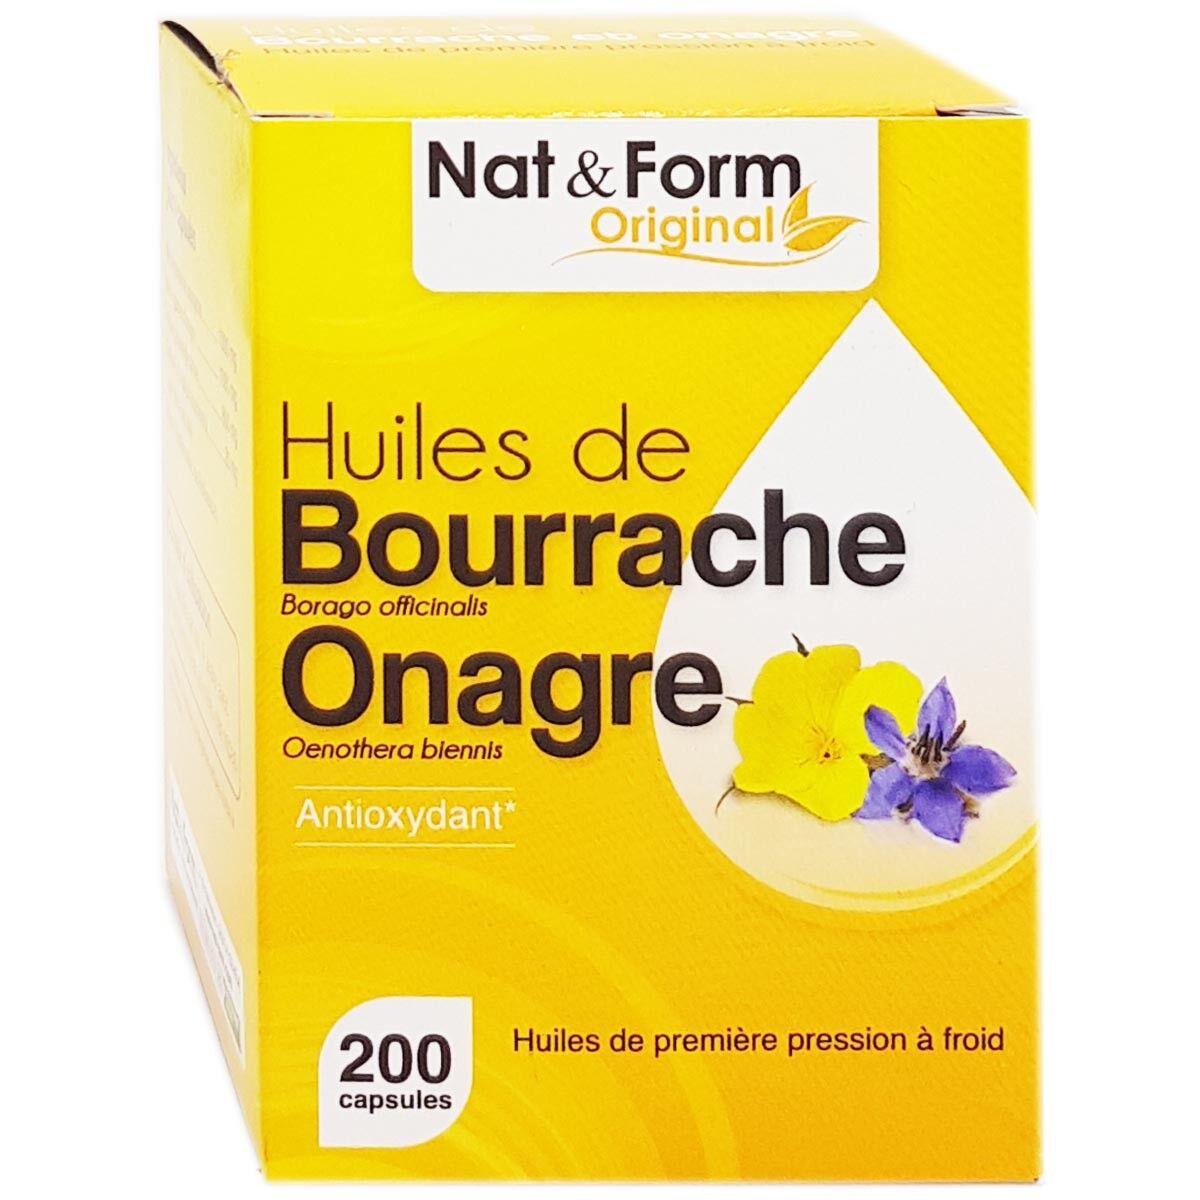 Nat & form original huiles de bourrache onagre 200 capsules